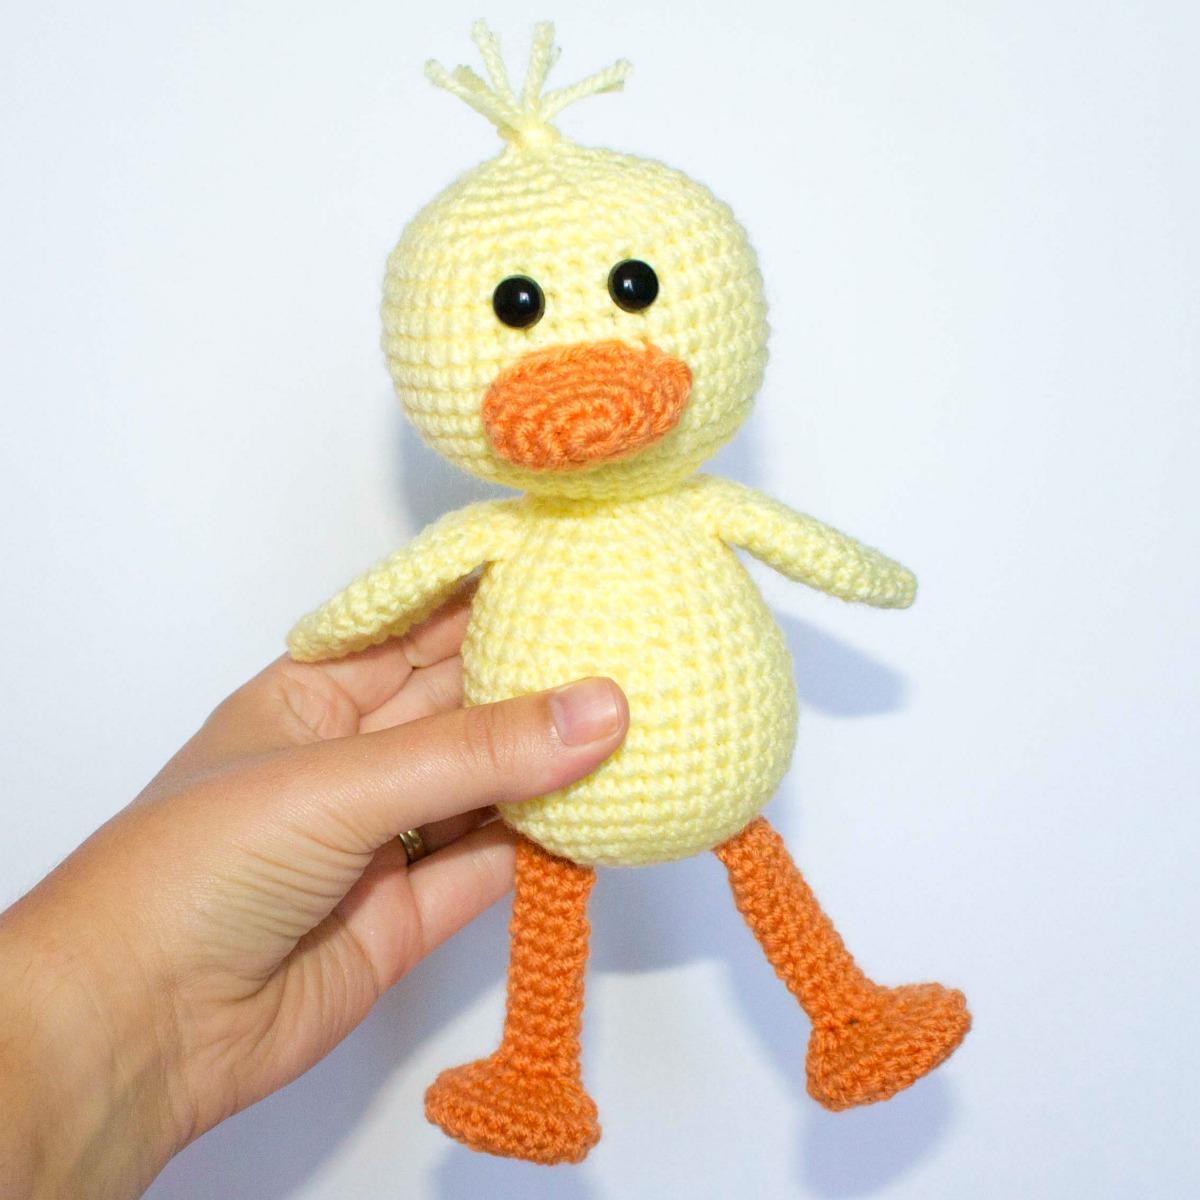 Crochet Duck Pattern Thefriendlyredfox Com